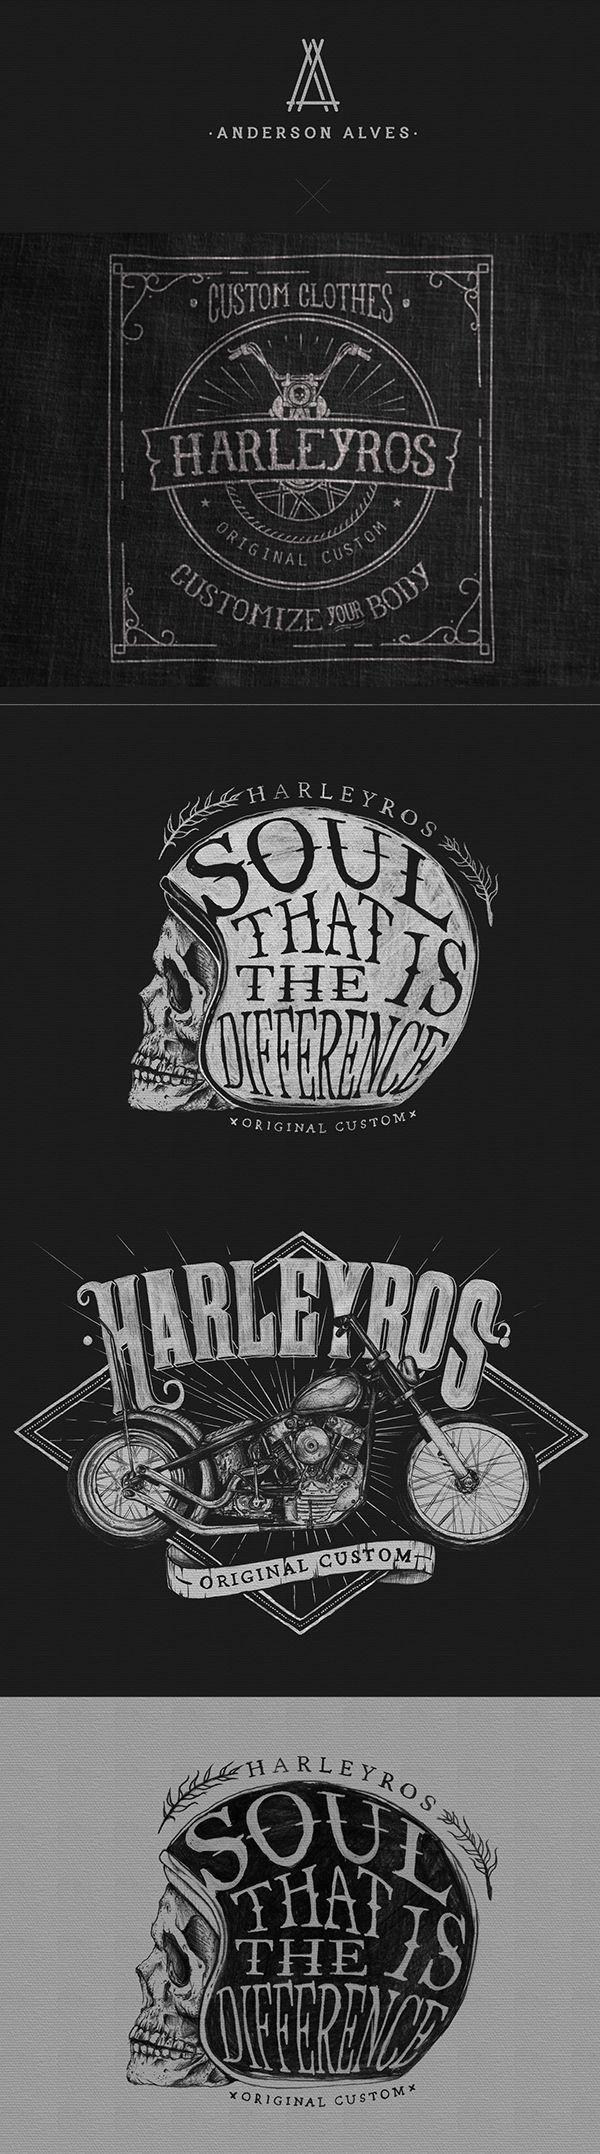 Harleyros Original Custom by Anderson Alves, via Behance